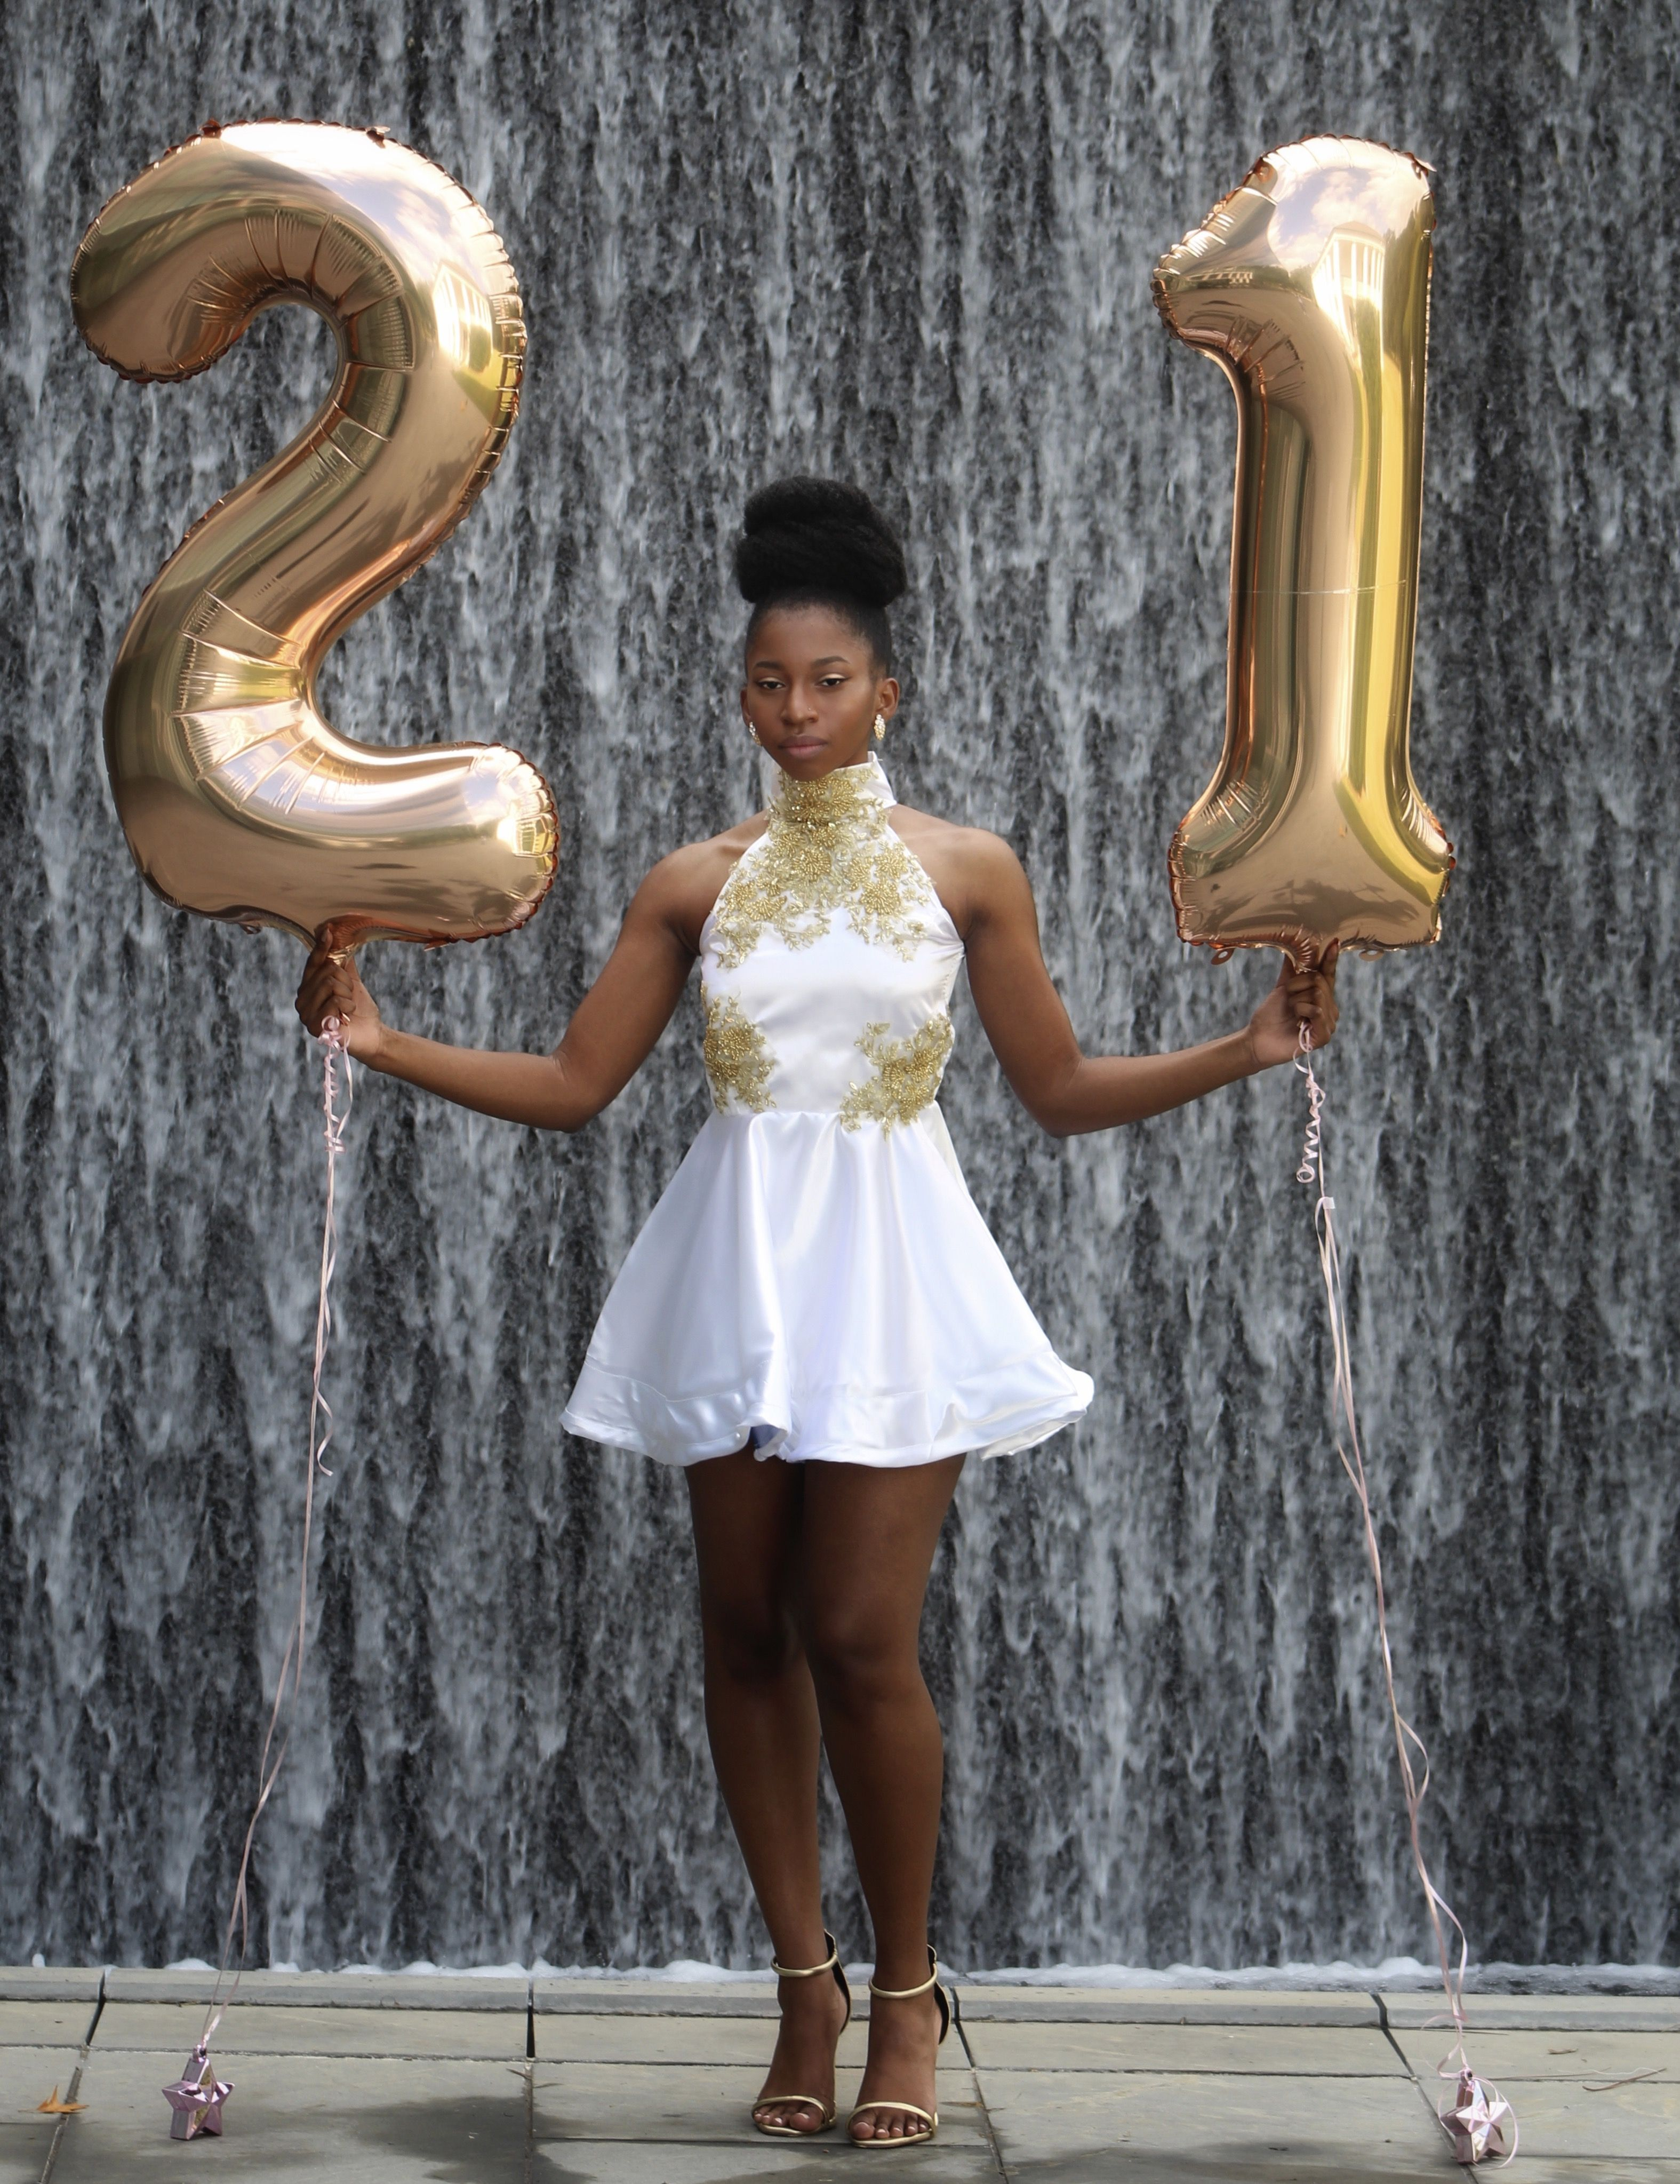 21st birthday photoshoot ideas 21st birthday in 2019